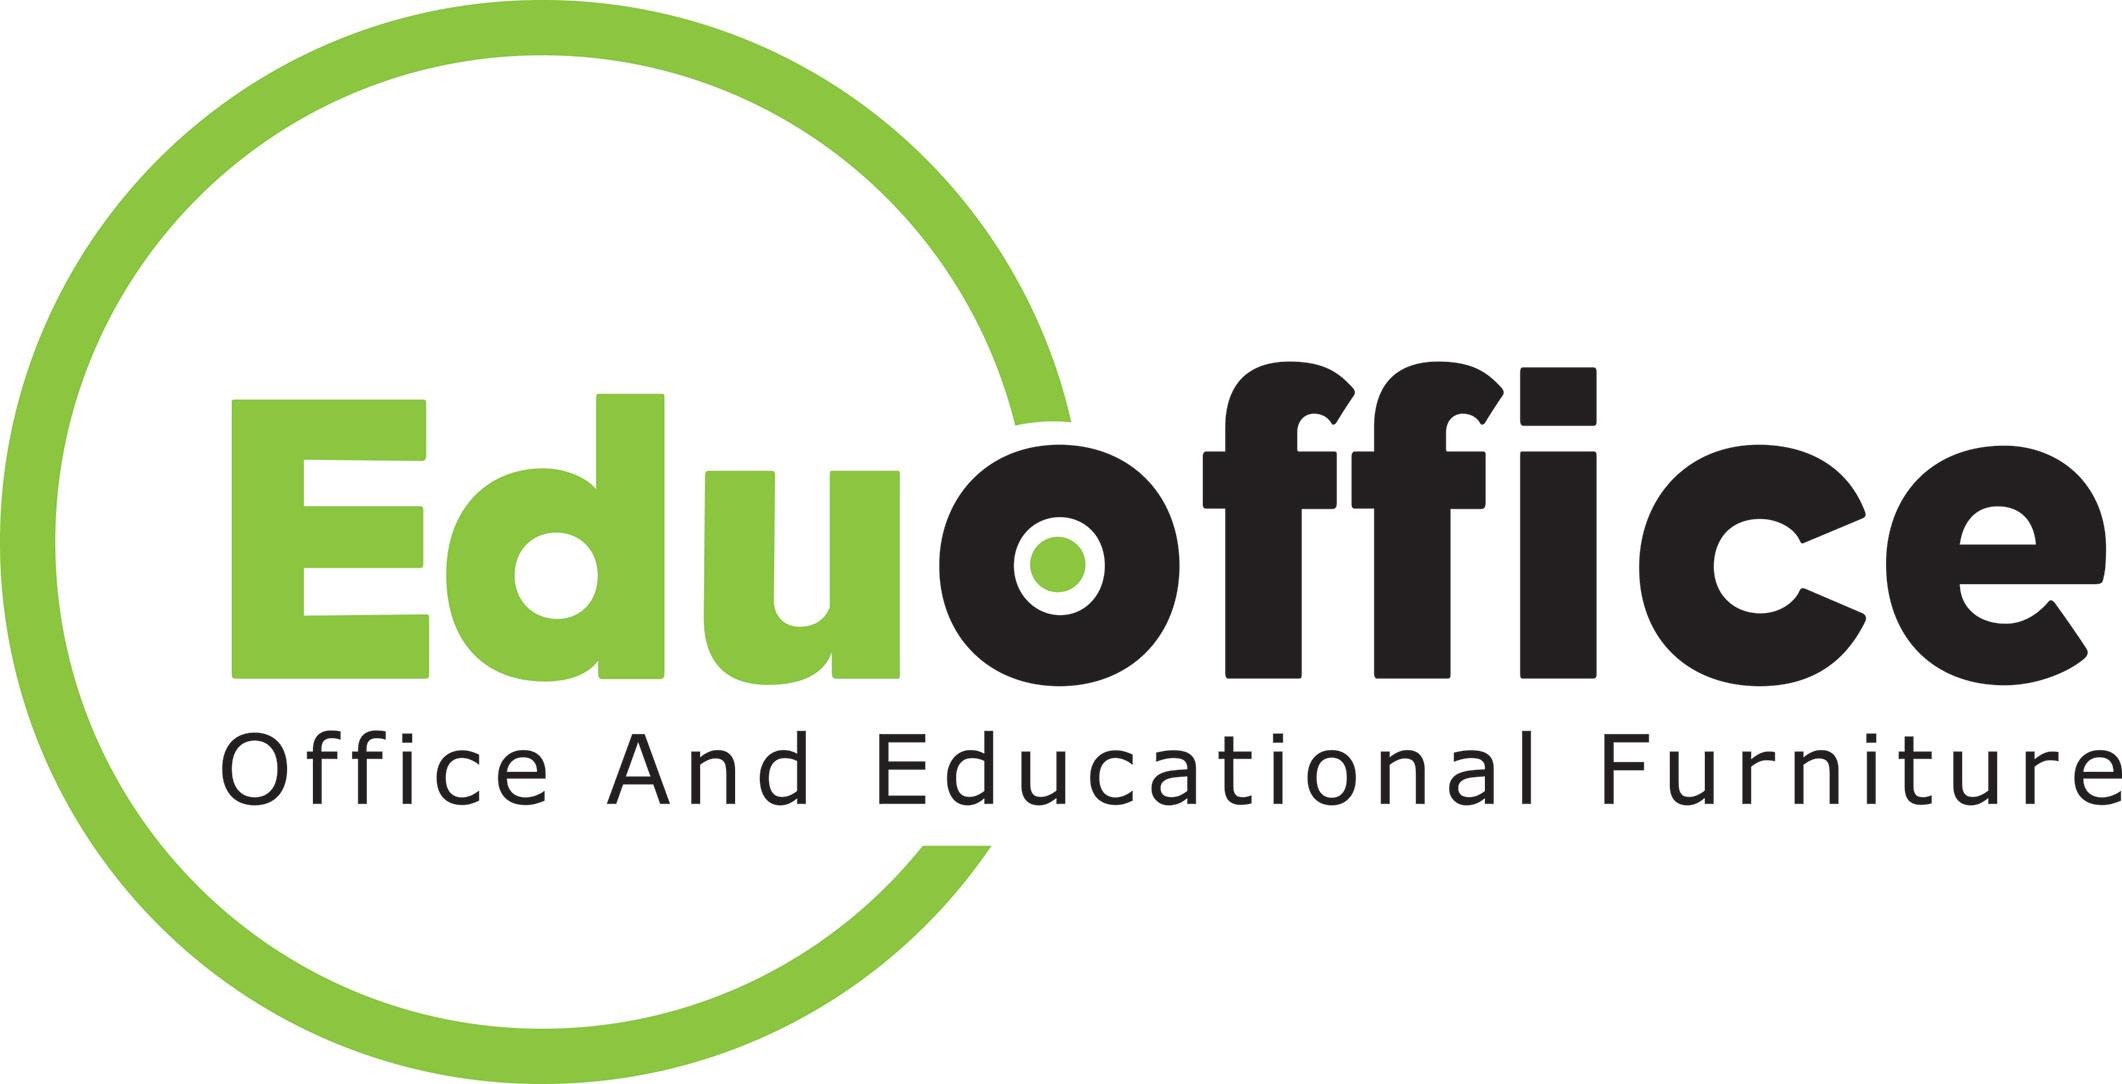 eduoffice logo - LOGO DEVELOPMENT